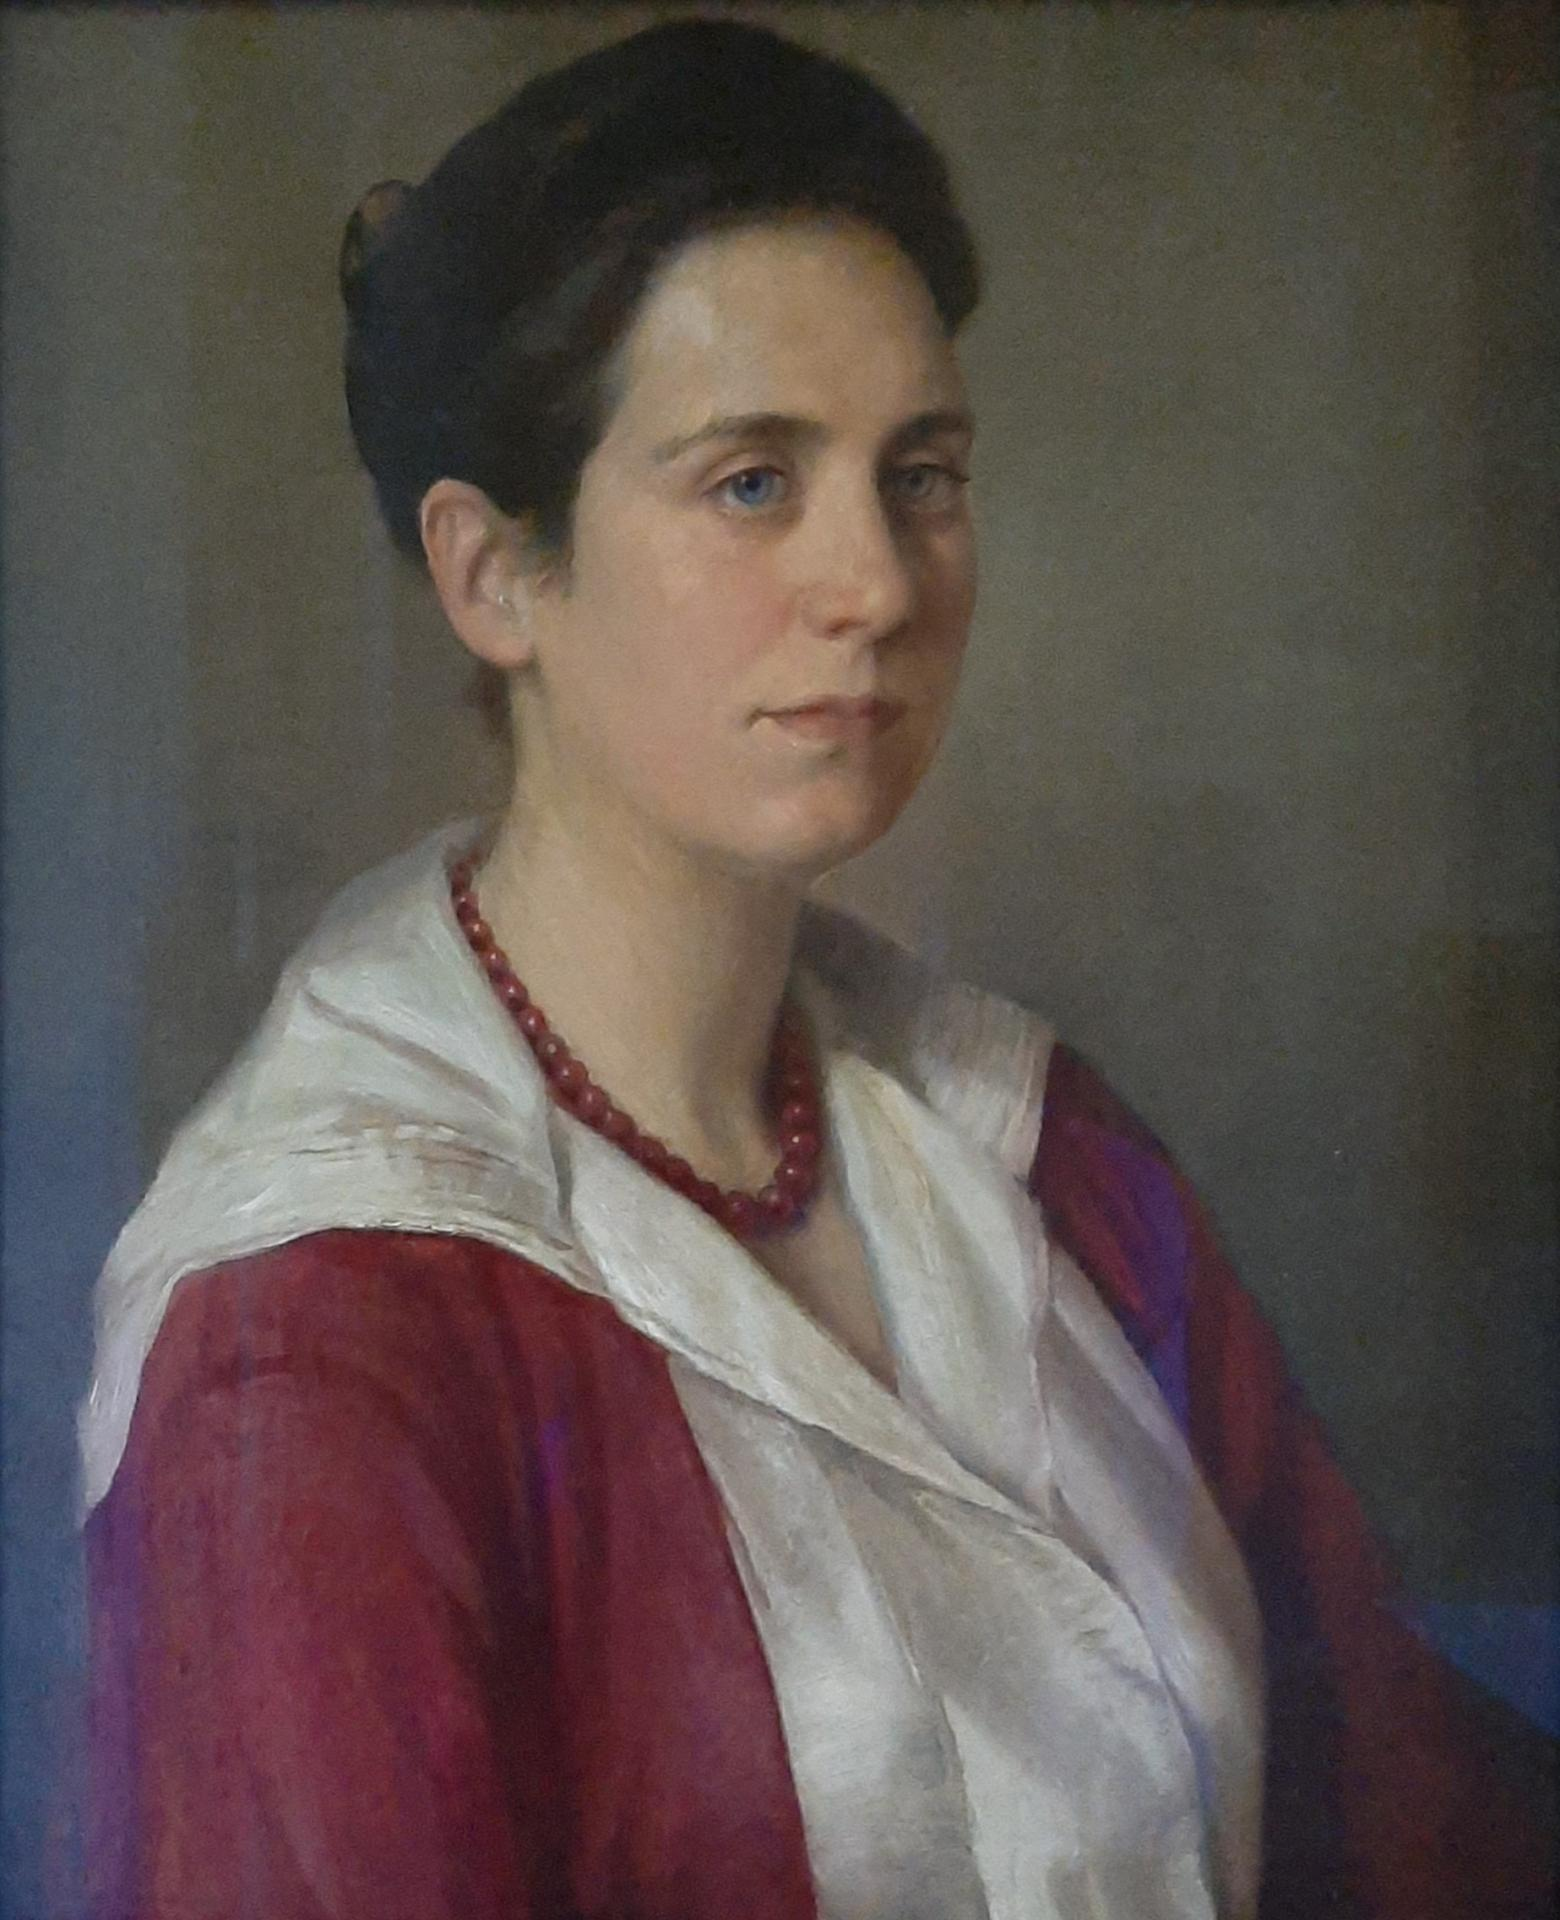 Bettina Encke